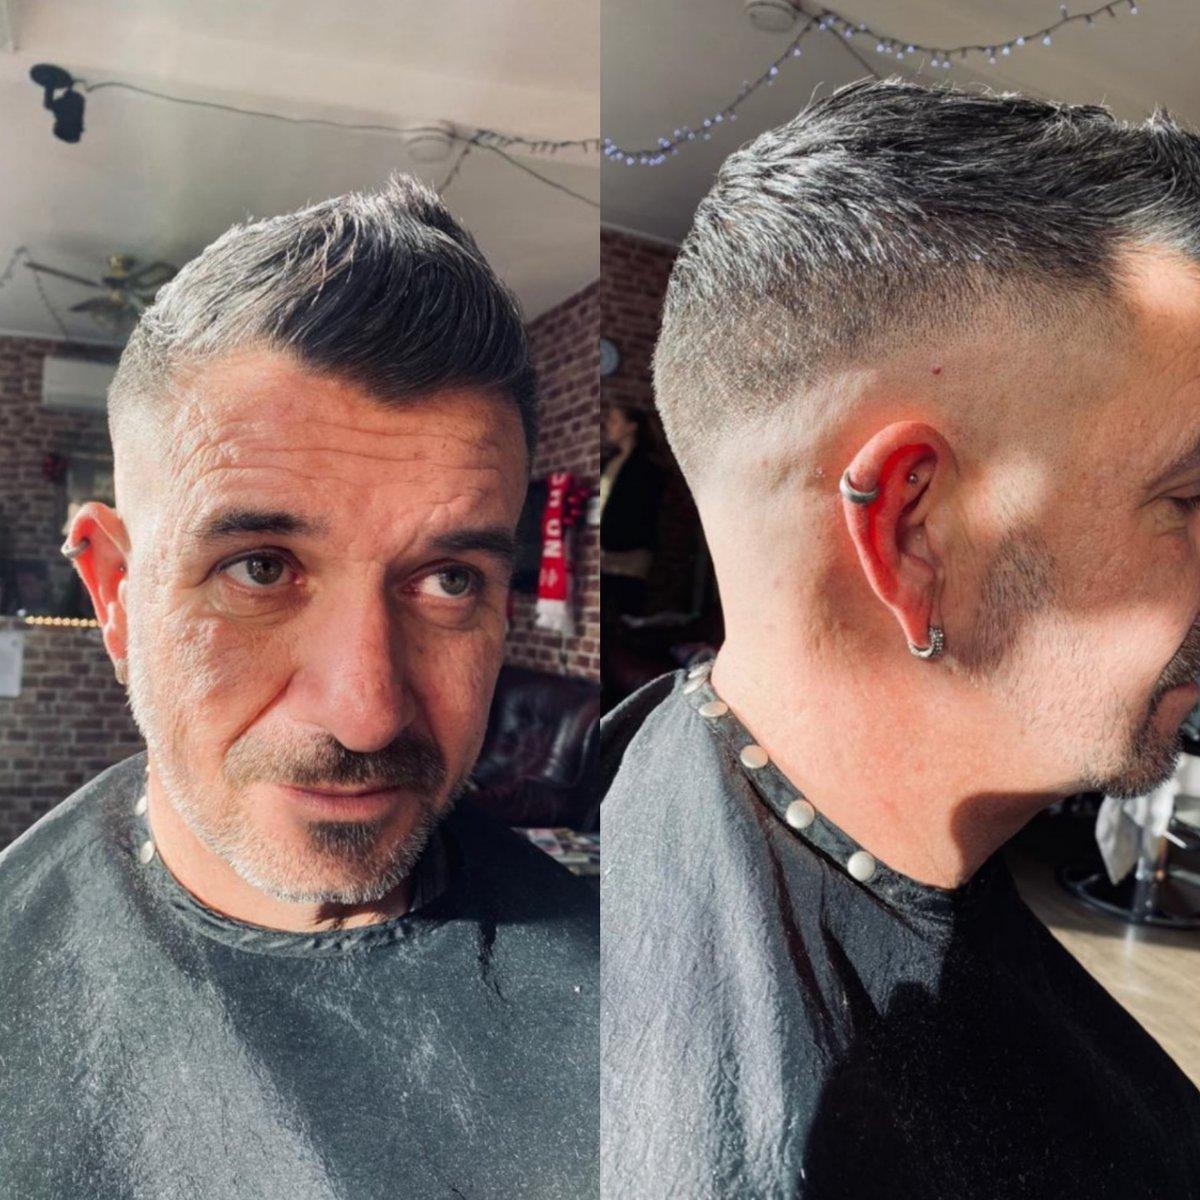 One of Jane's skin fades from Saturday  #barber #barbershop #barberboss #barbershave #Barberconnect #barbernation #barberlove #Barberette #Southamptonbarber #TottonBarber #skin #skingade #grooming #MensHealth #mensgrooming #bestbarbershop pic.twitter.com/LIDFWfI4tB